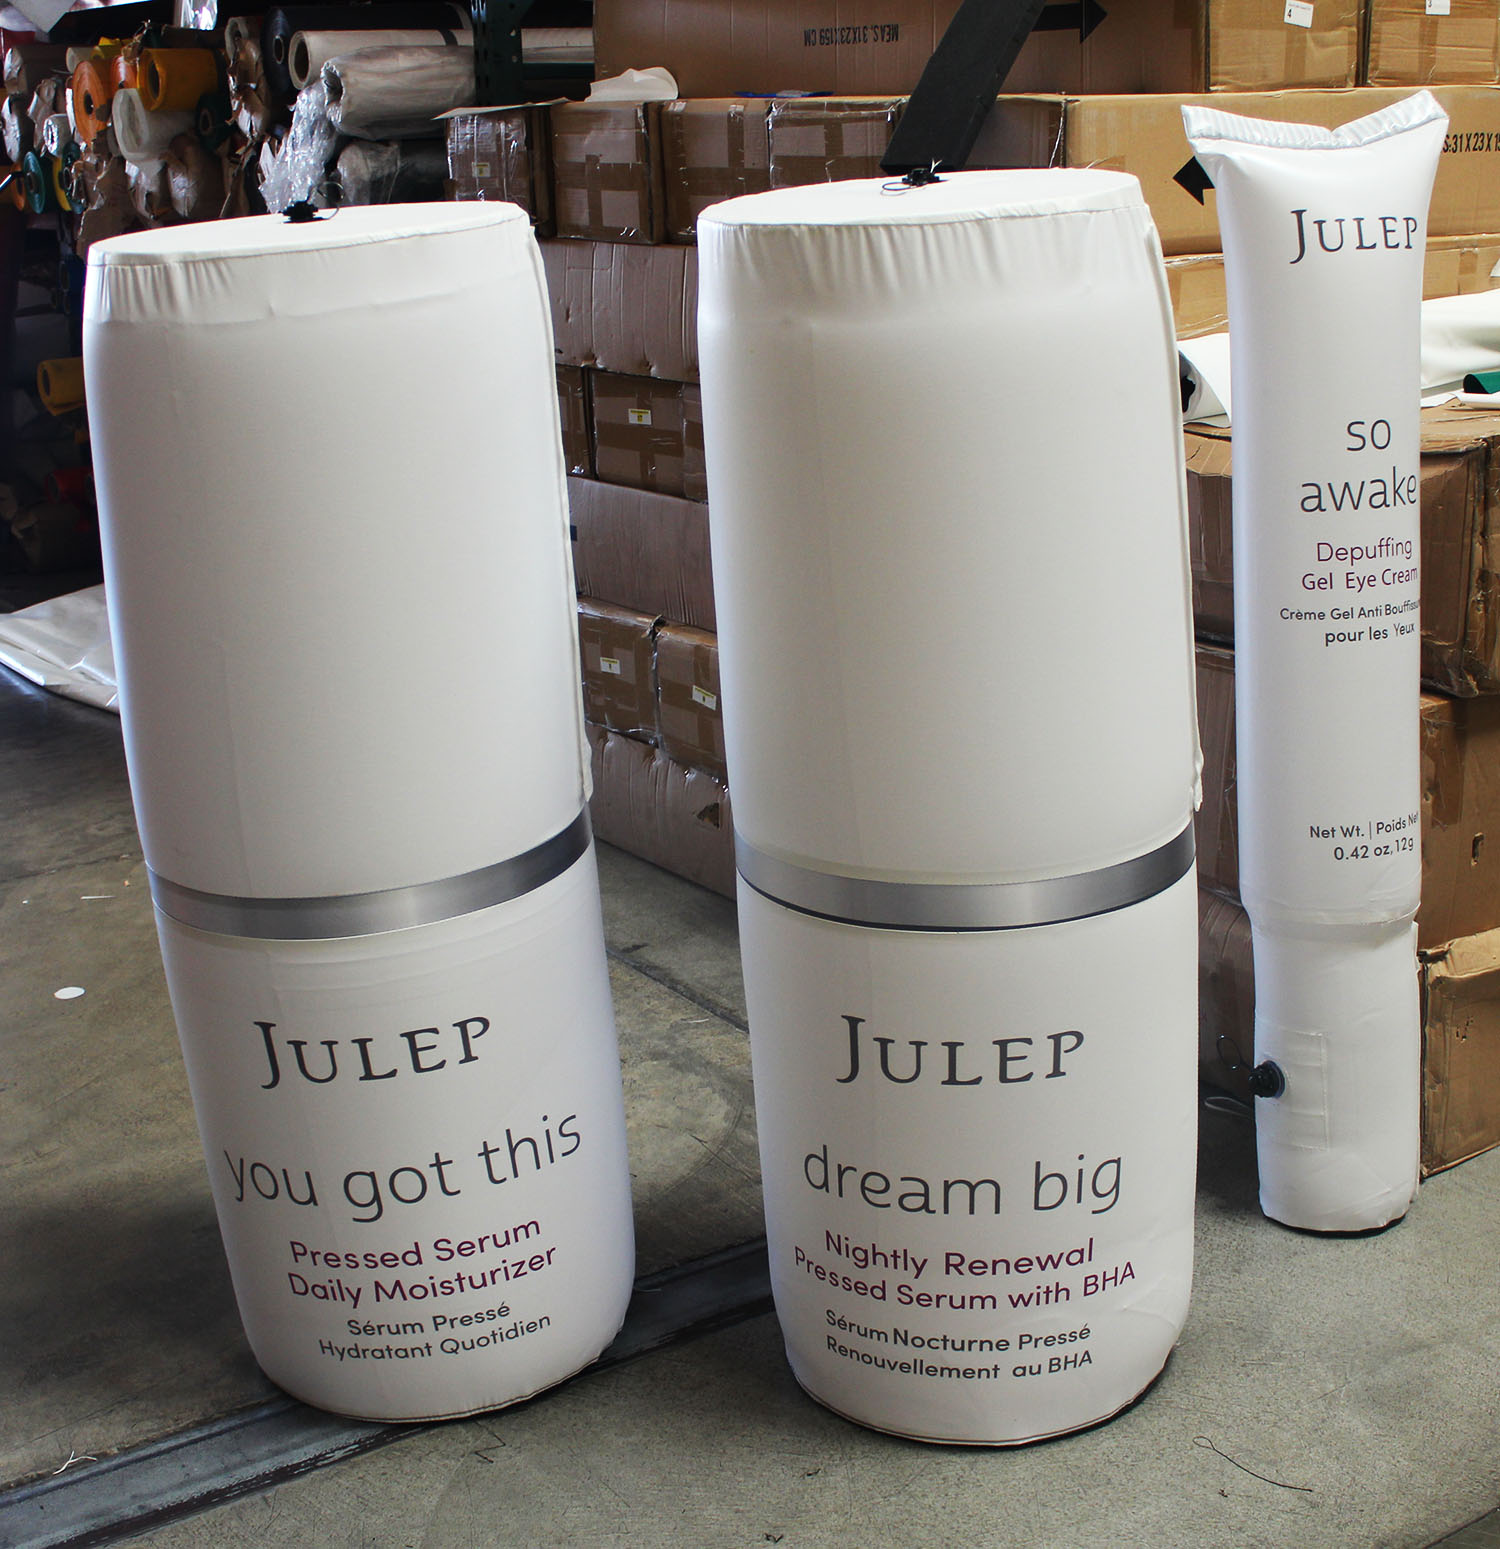 julep-beauty-replicas-inflatables-airtight